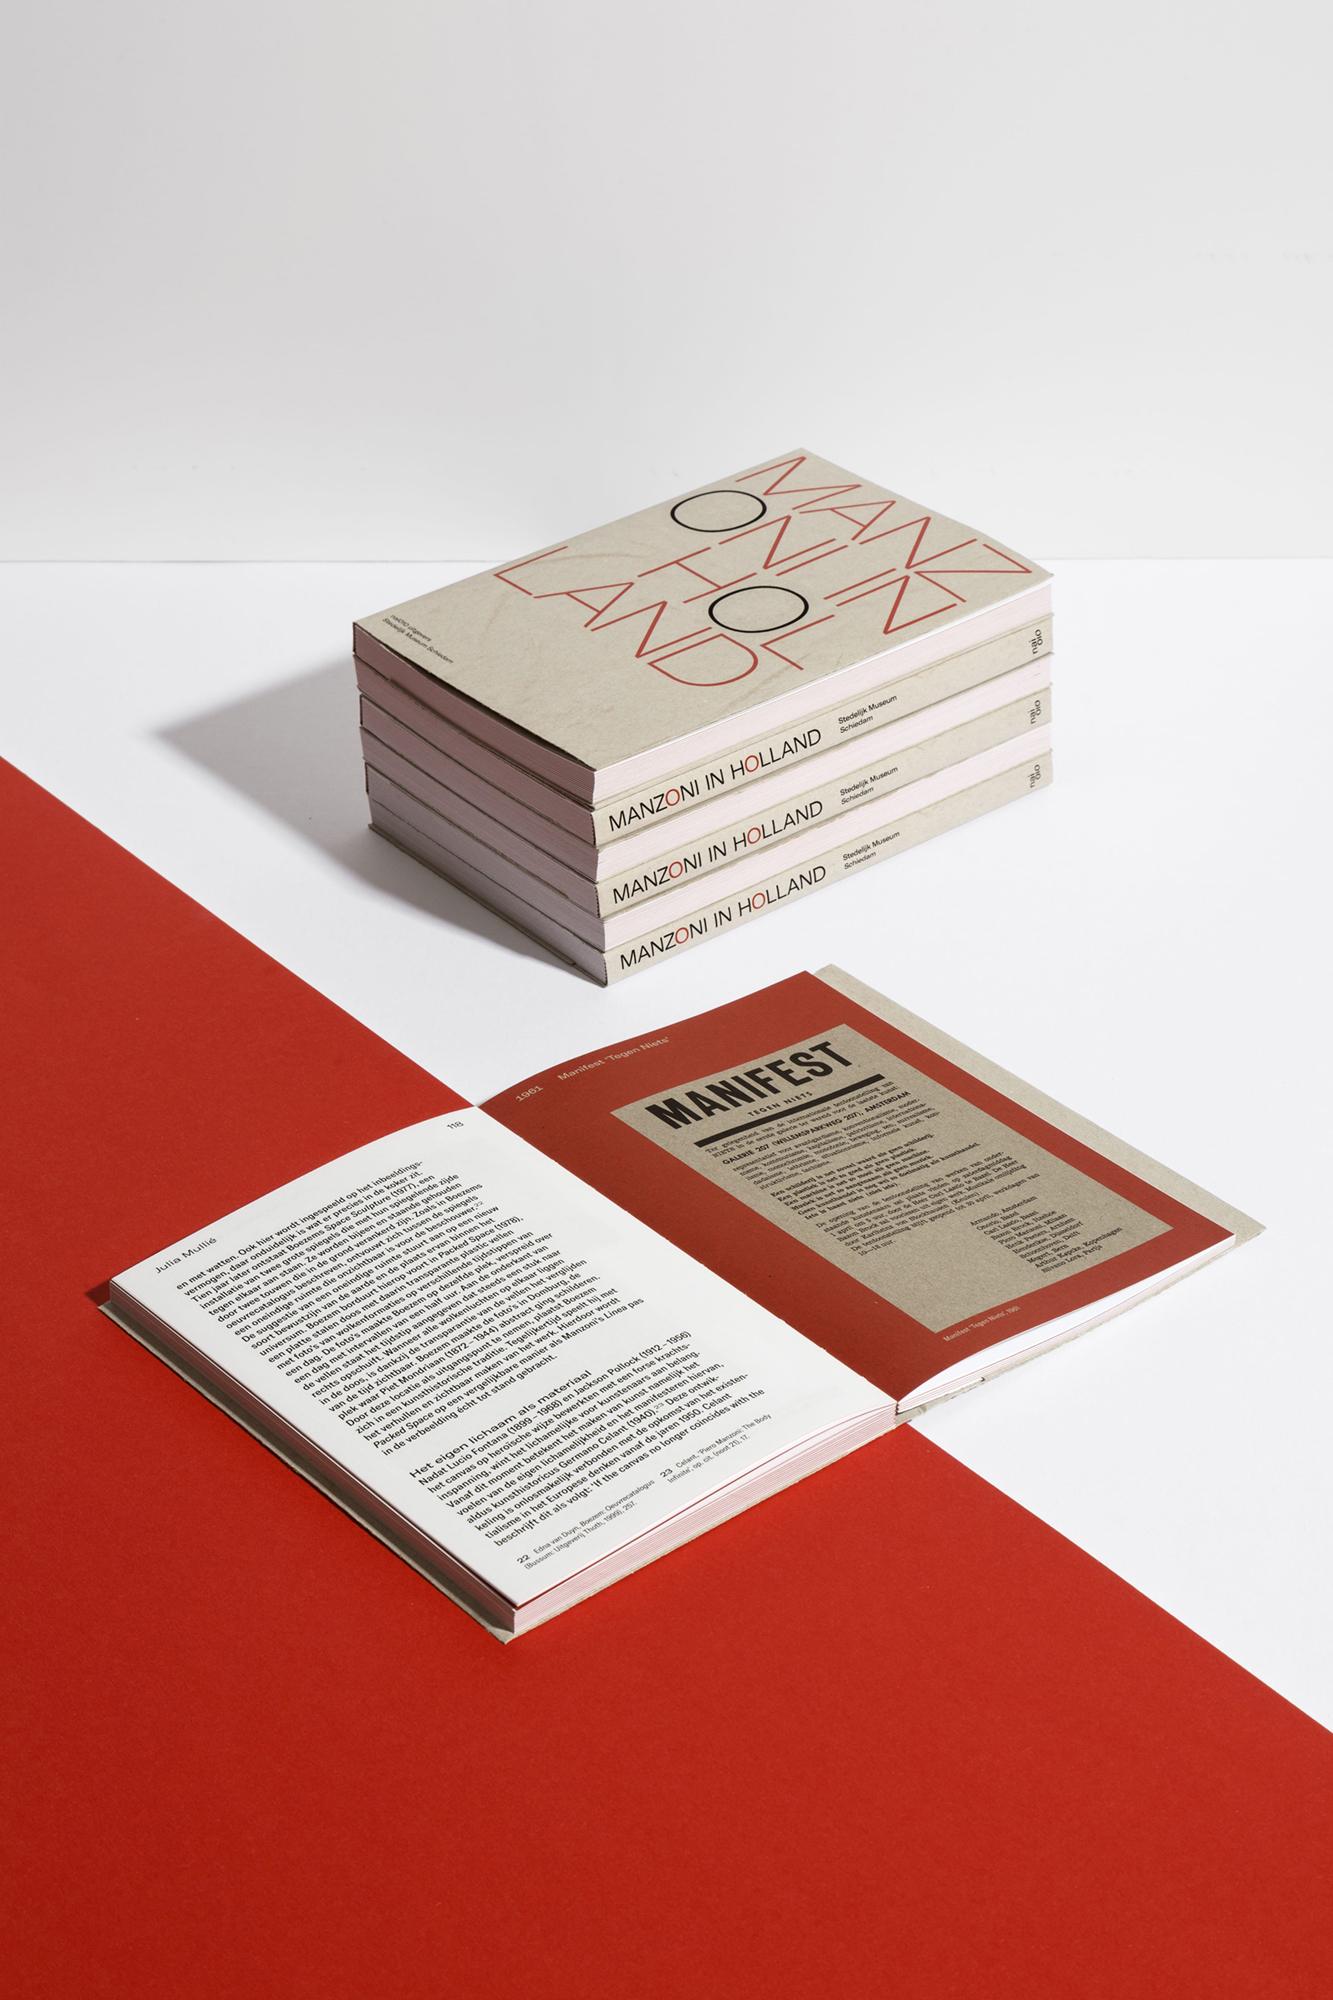 Manzoni in Holland Stedelijk Museum Schiedam Colin Huizing Julia Mullié Antoon Melissen nai010 publishers